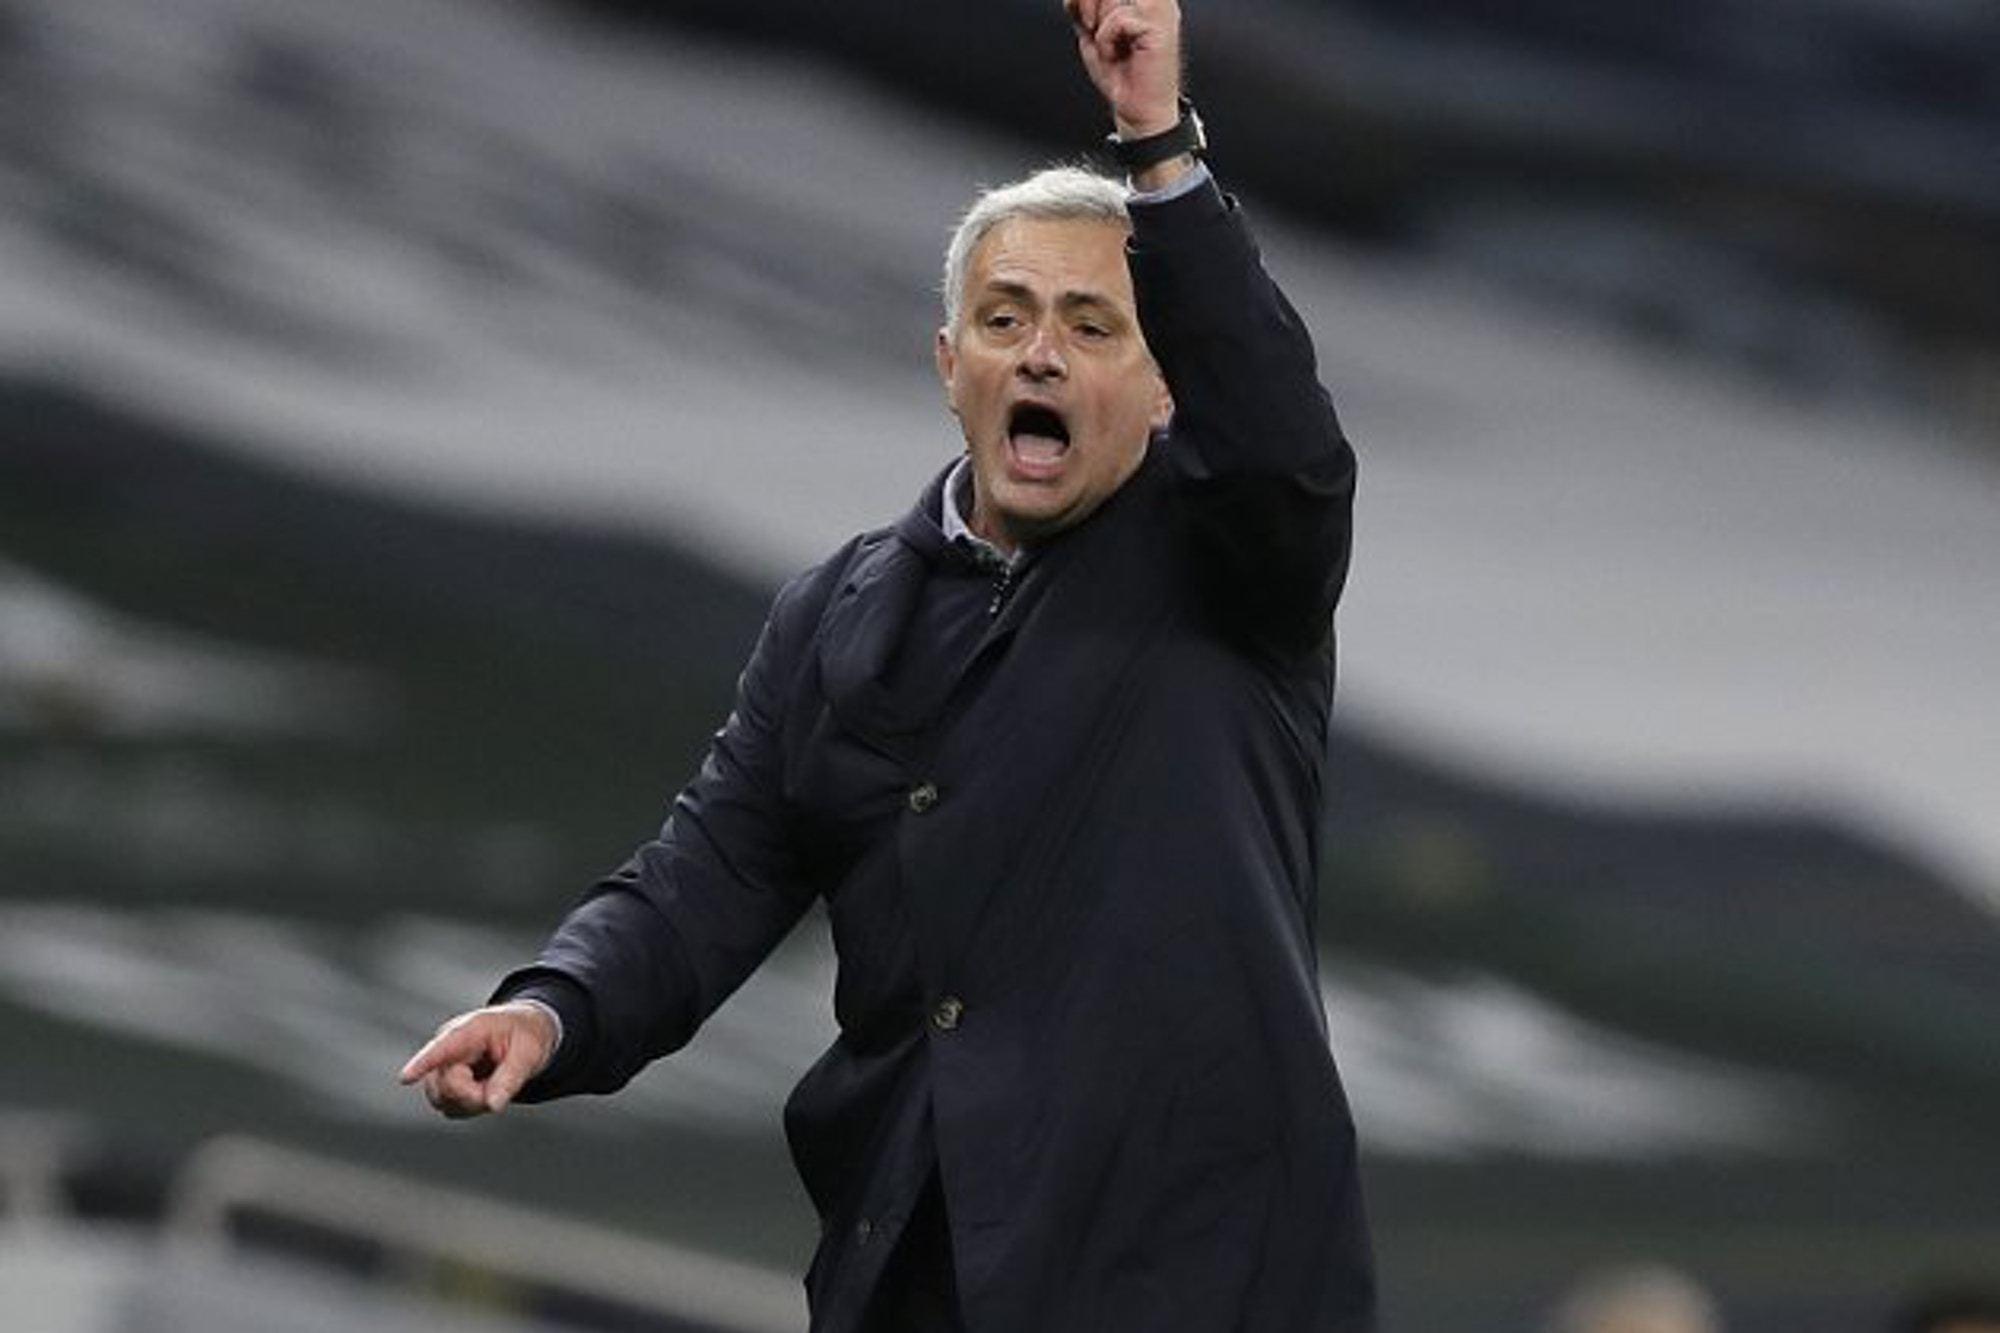 Mourinho nói gắt sau khi Tottenham thua Liverpool phút chót